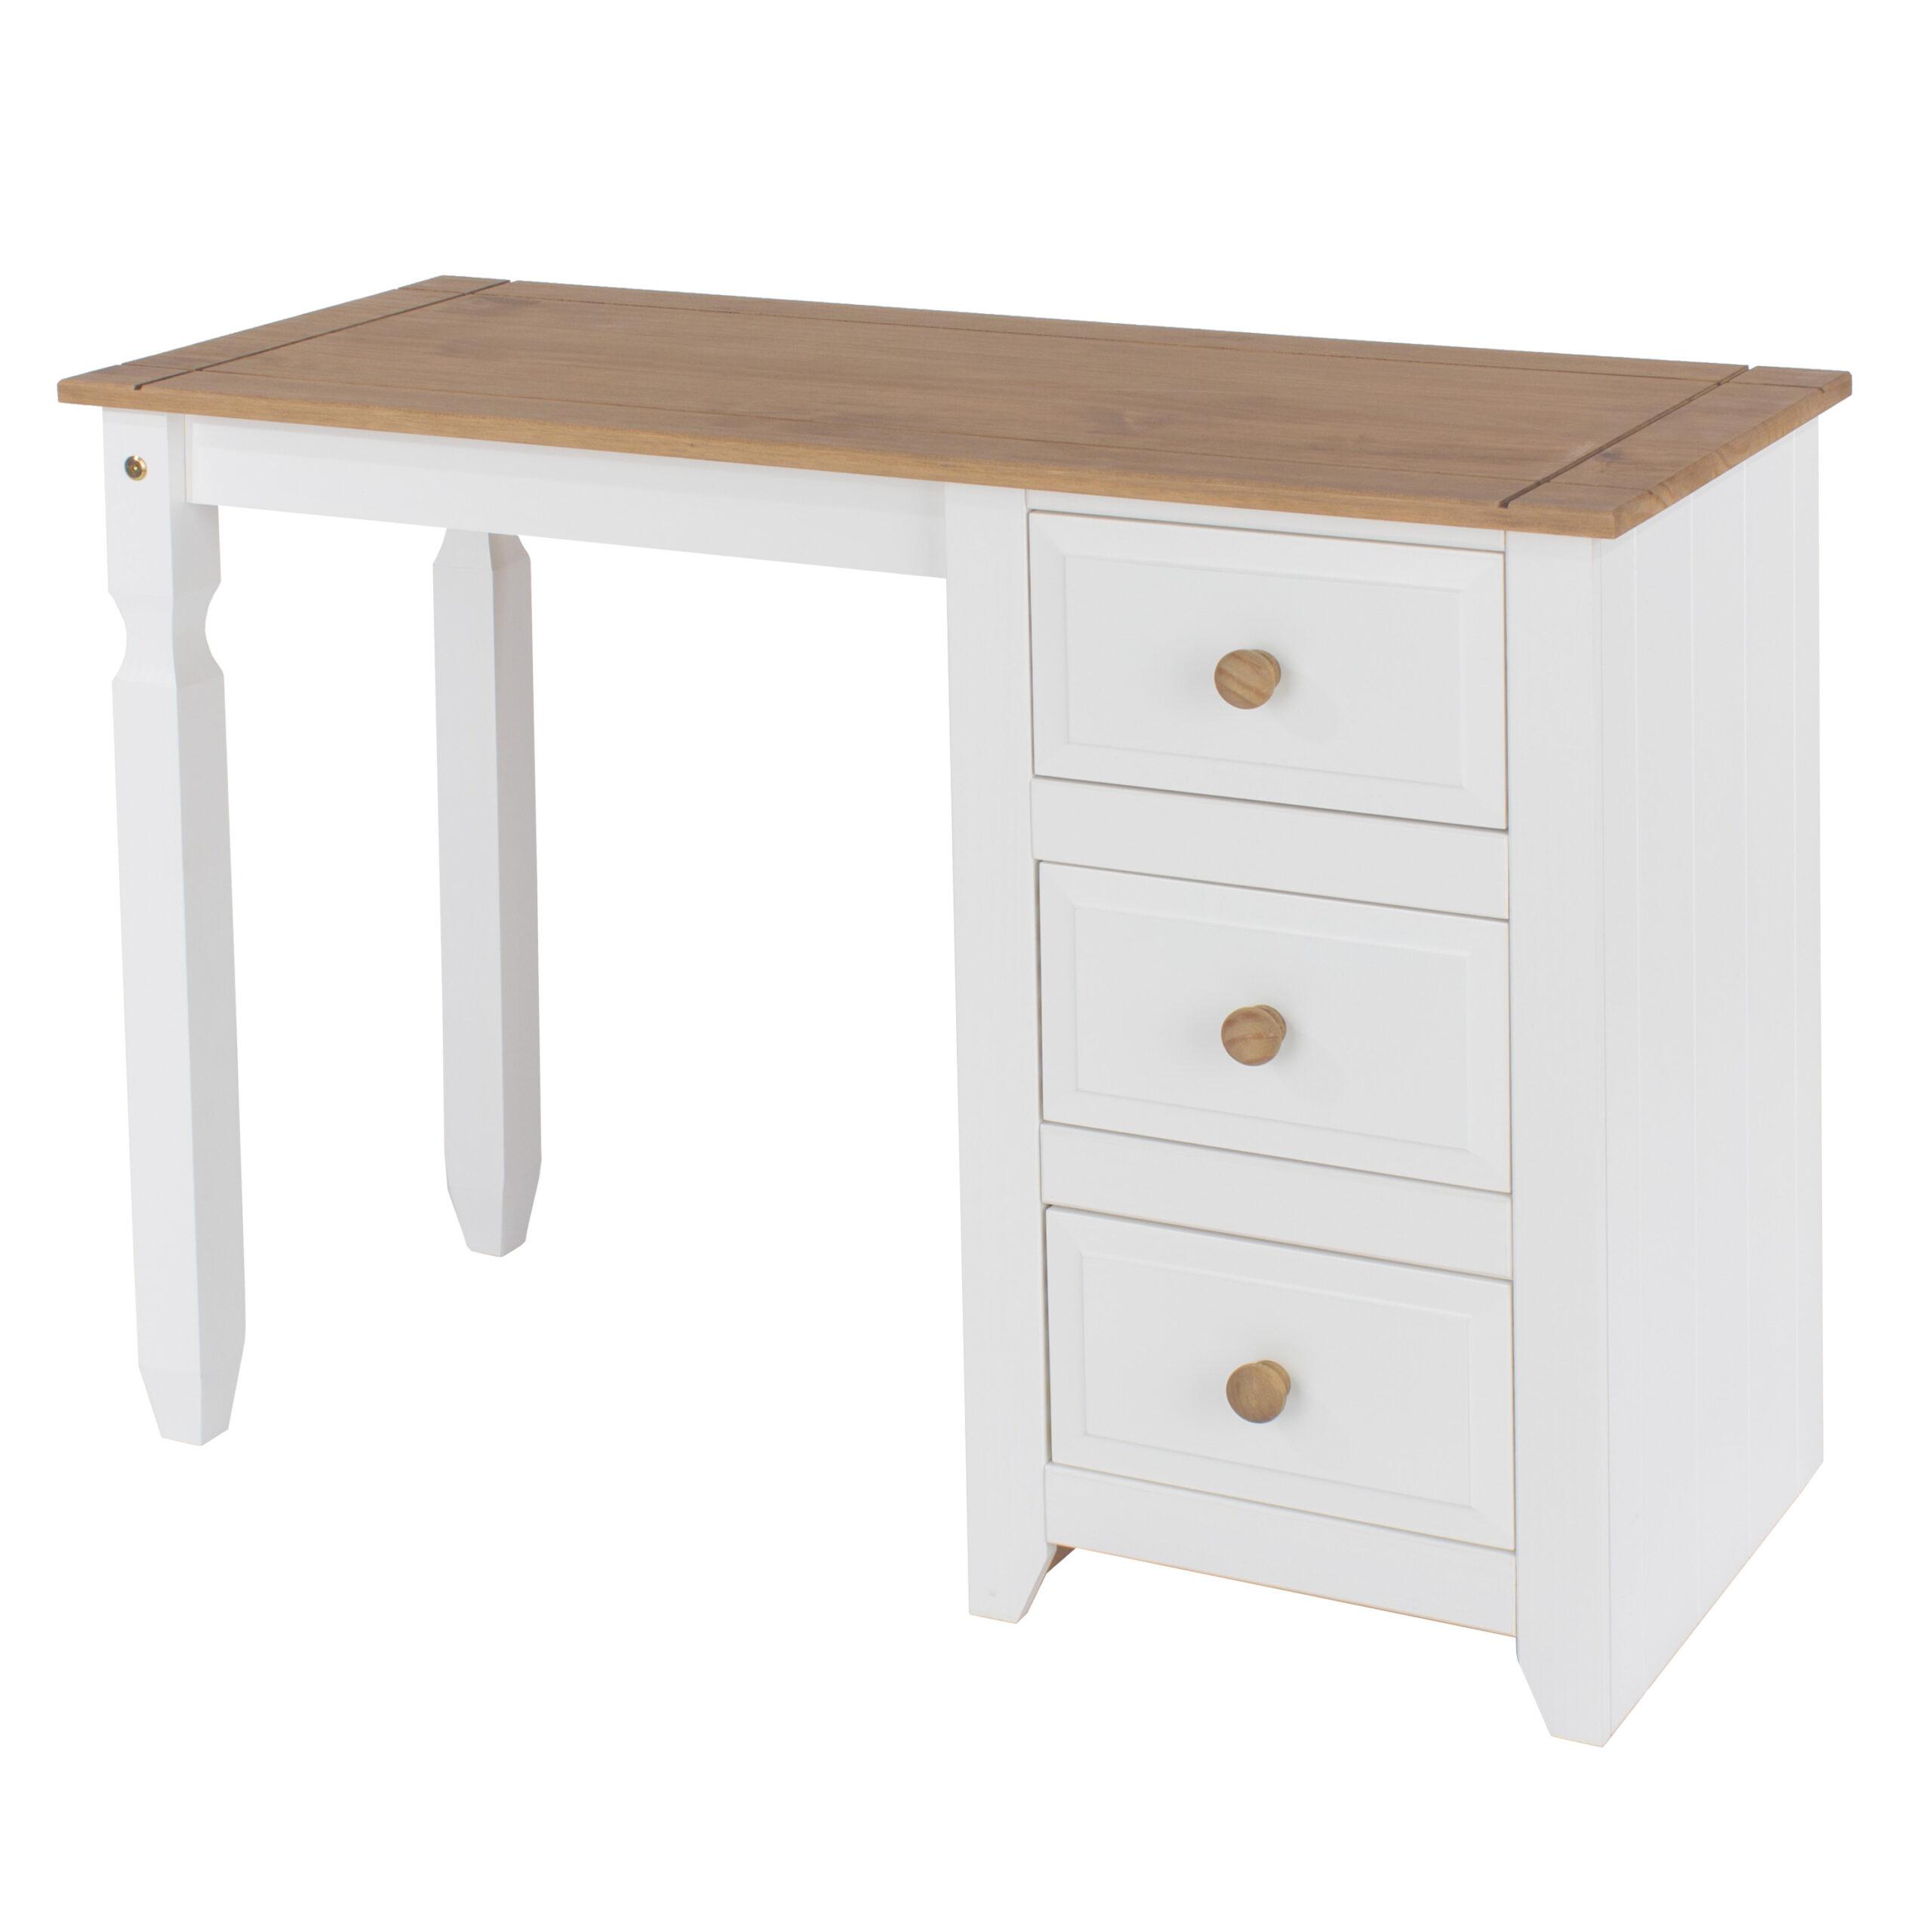 Shelton Pine And White Single Pedestal Dressing Table